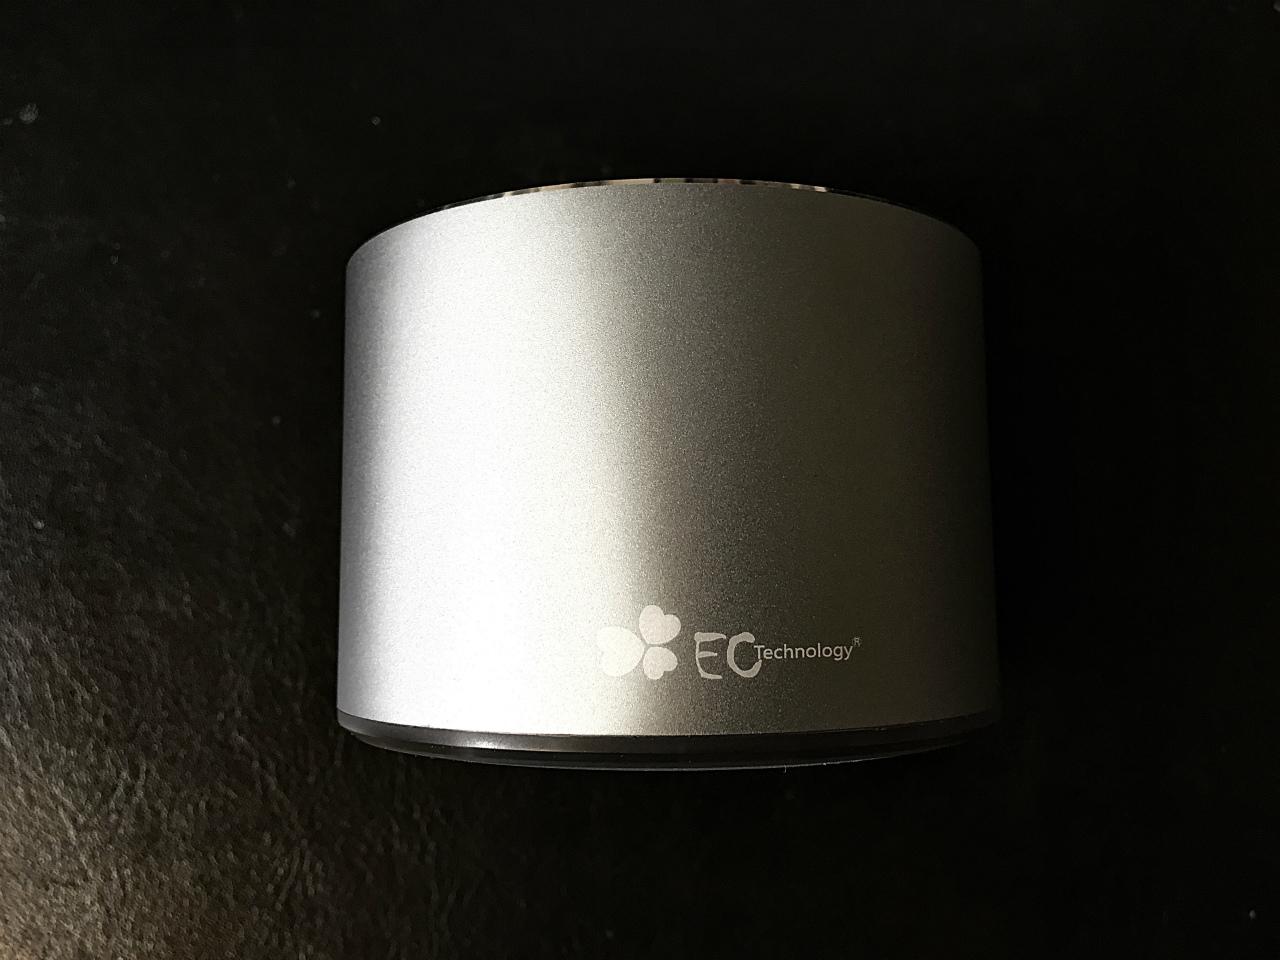 pr-ec-technology-s1021001-03